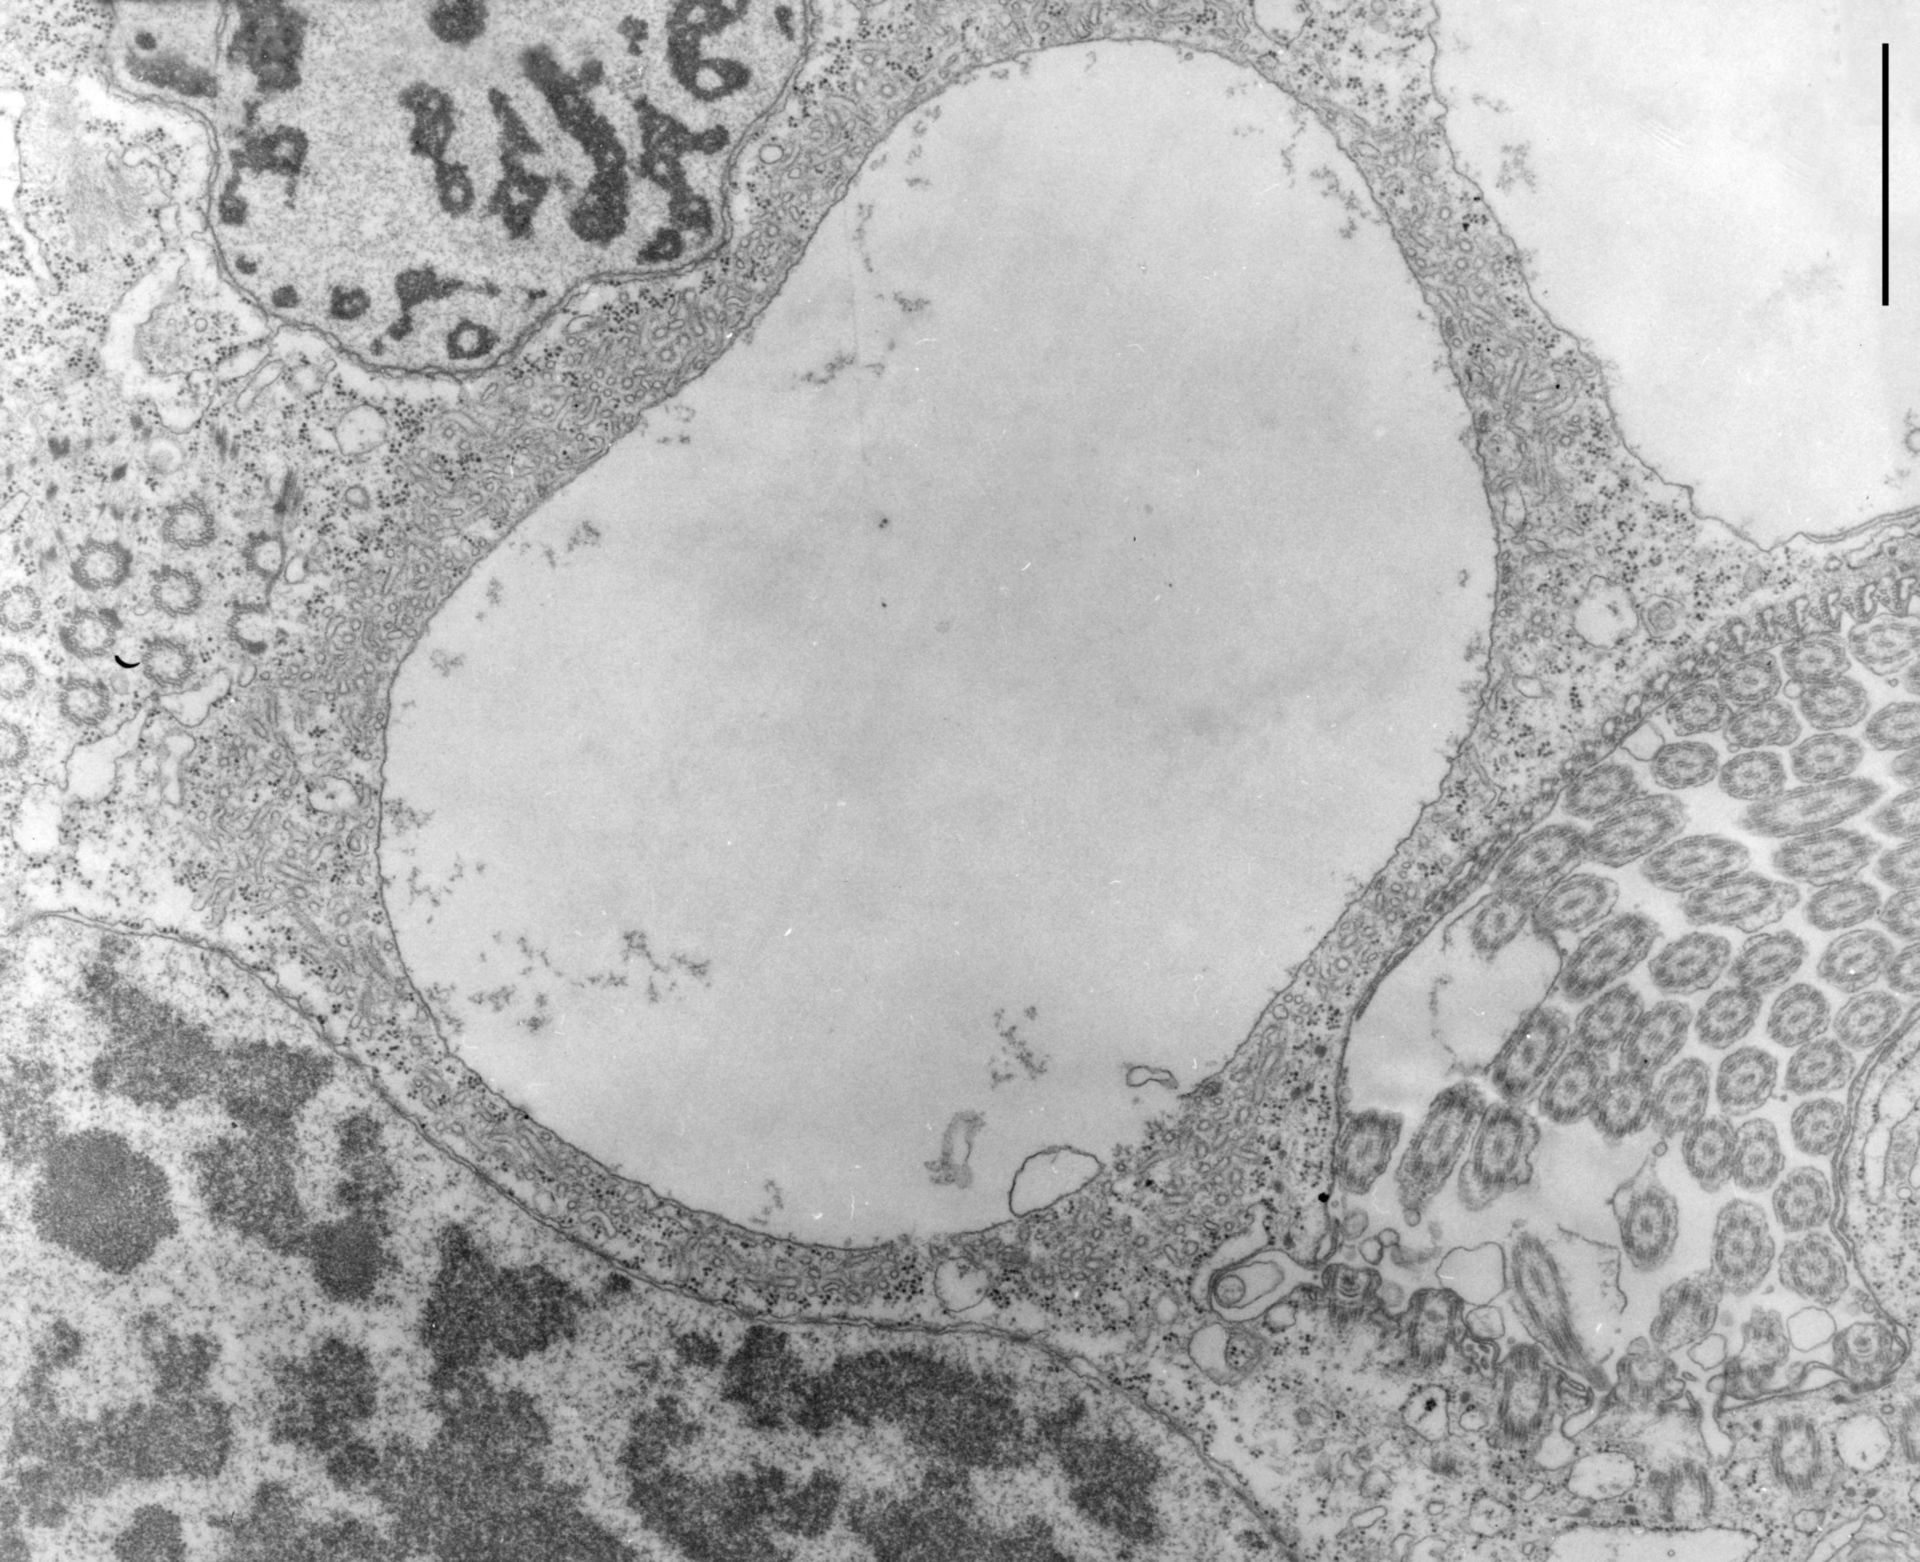 Opercularia coarctata (Microtubule basal body) - CIL:9910